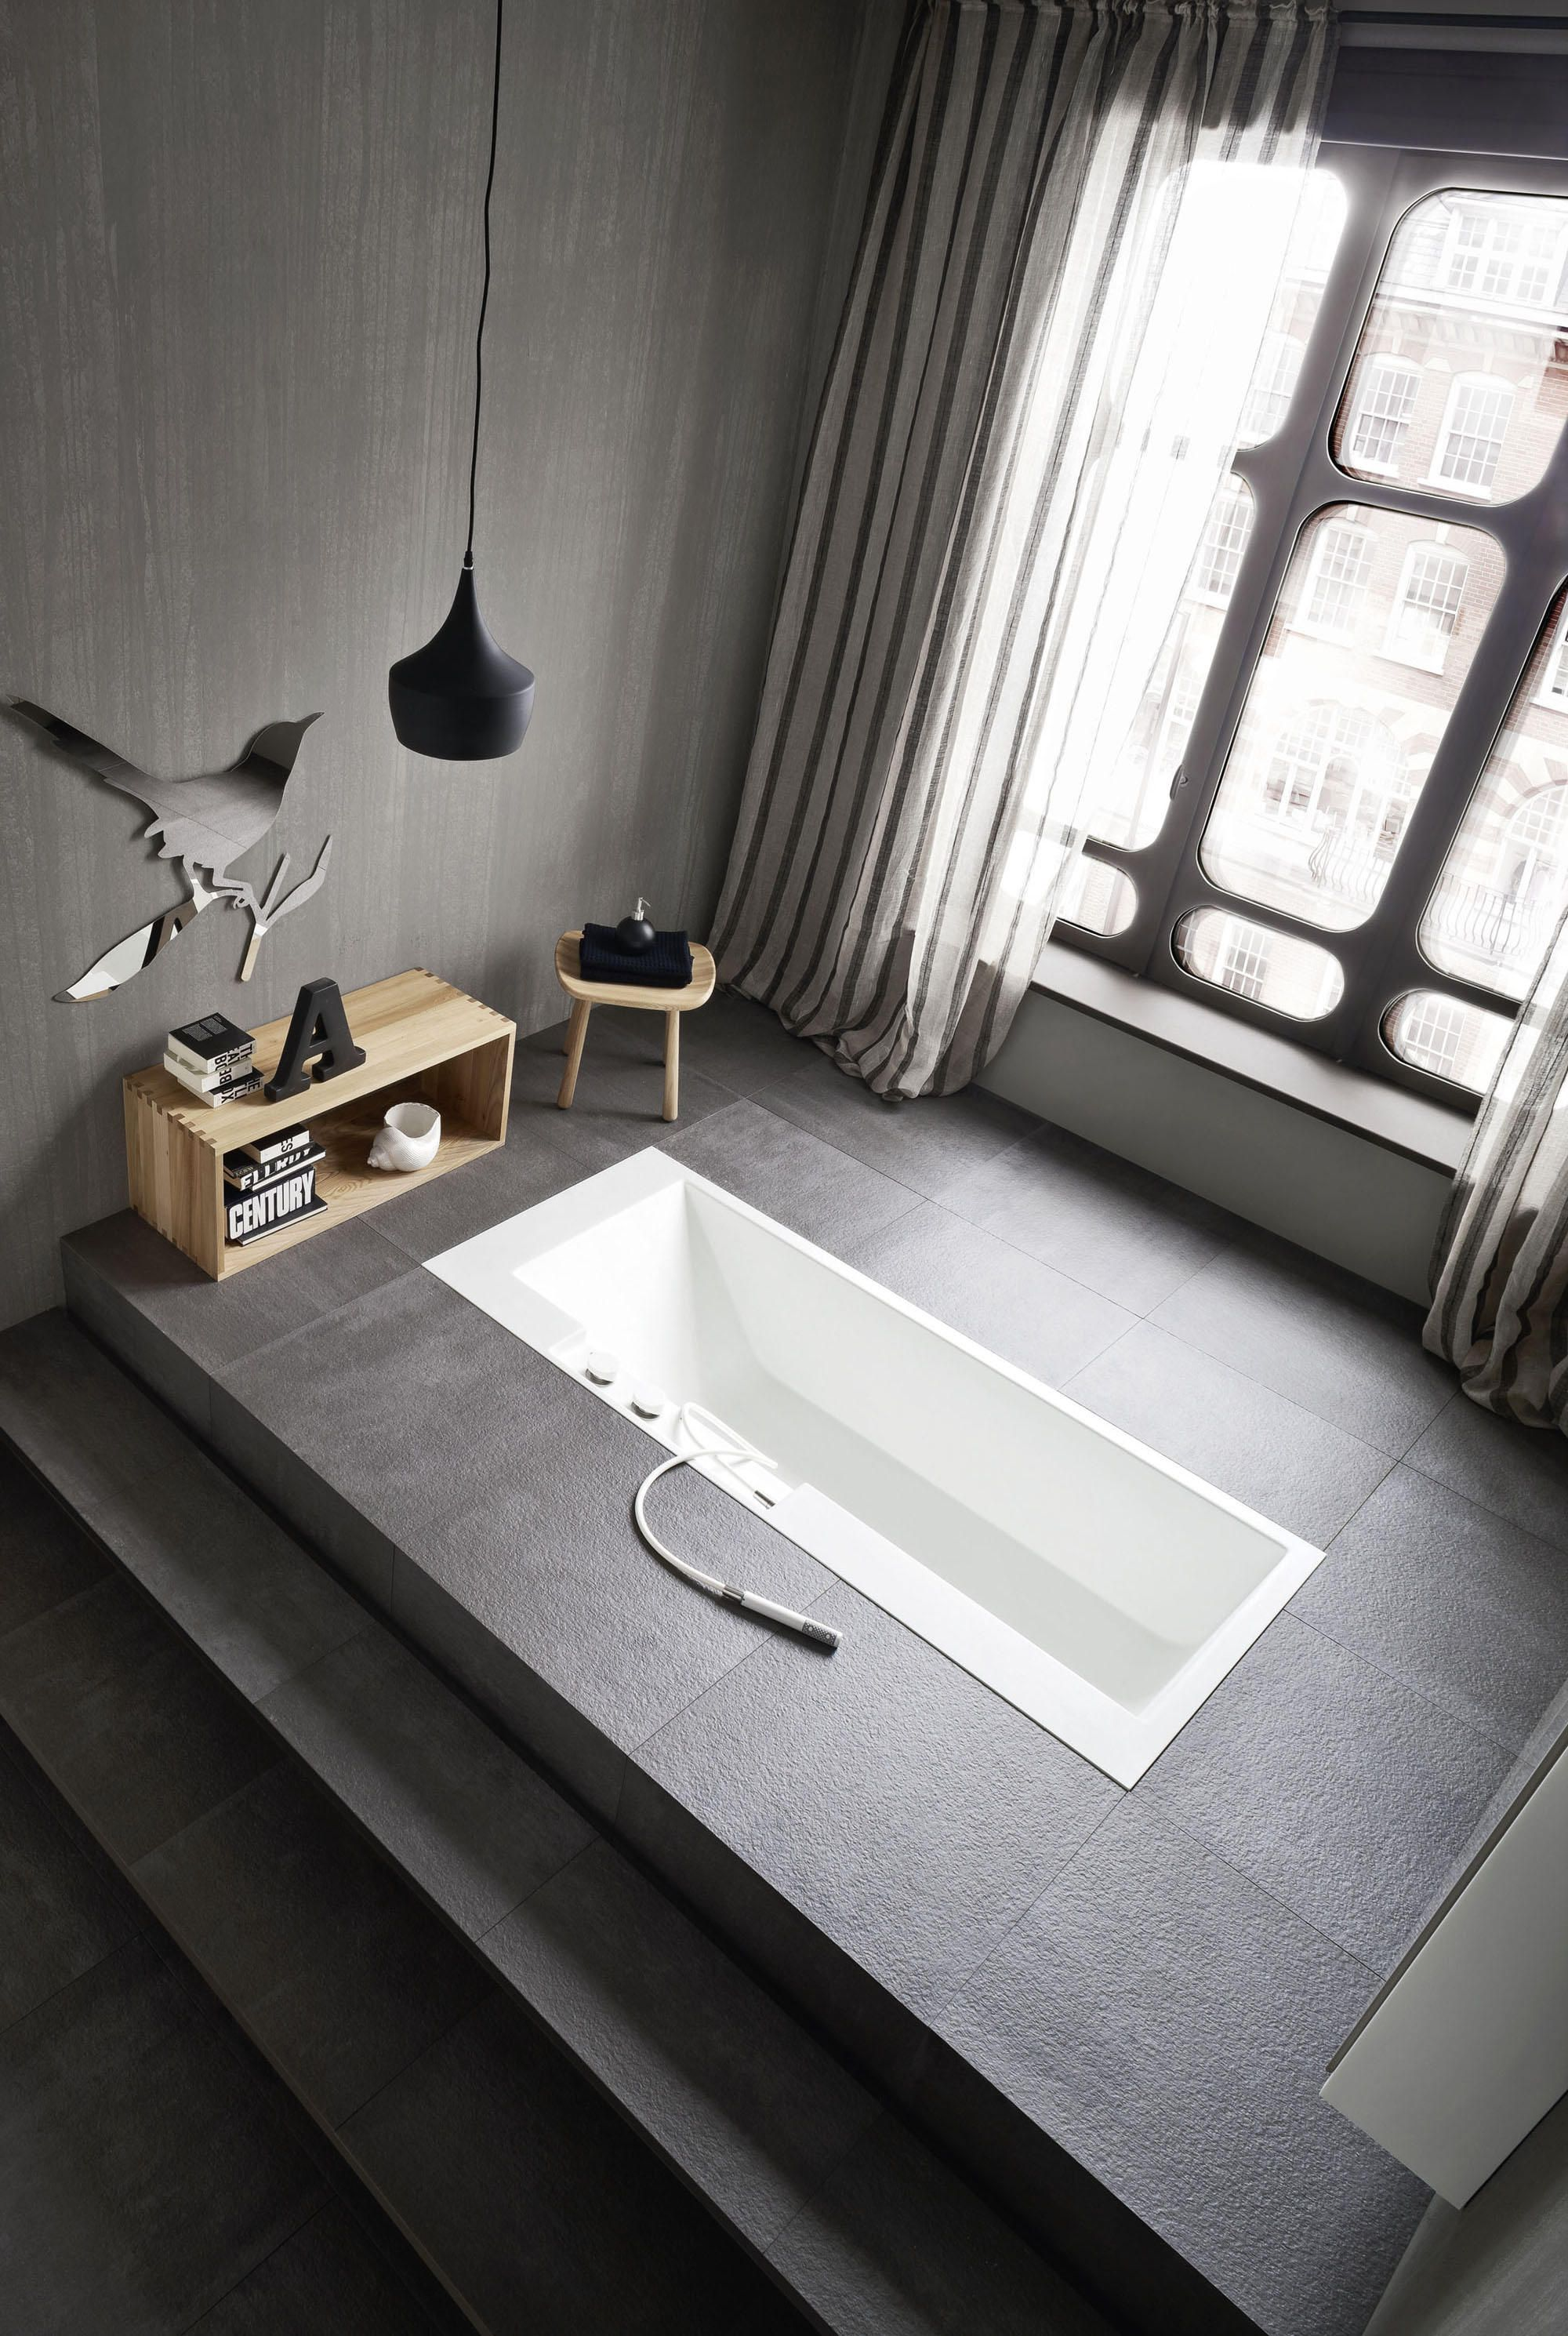 Ergo Nomic Recessed Bathtub By Rexa Design Built In Bathtubs